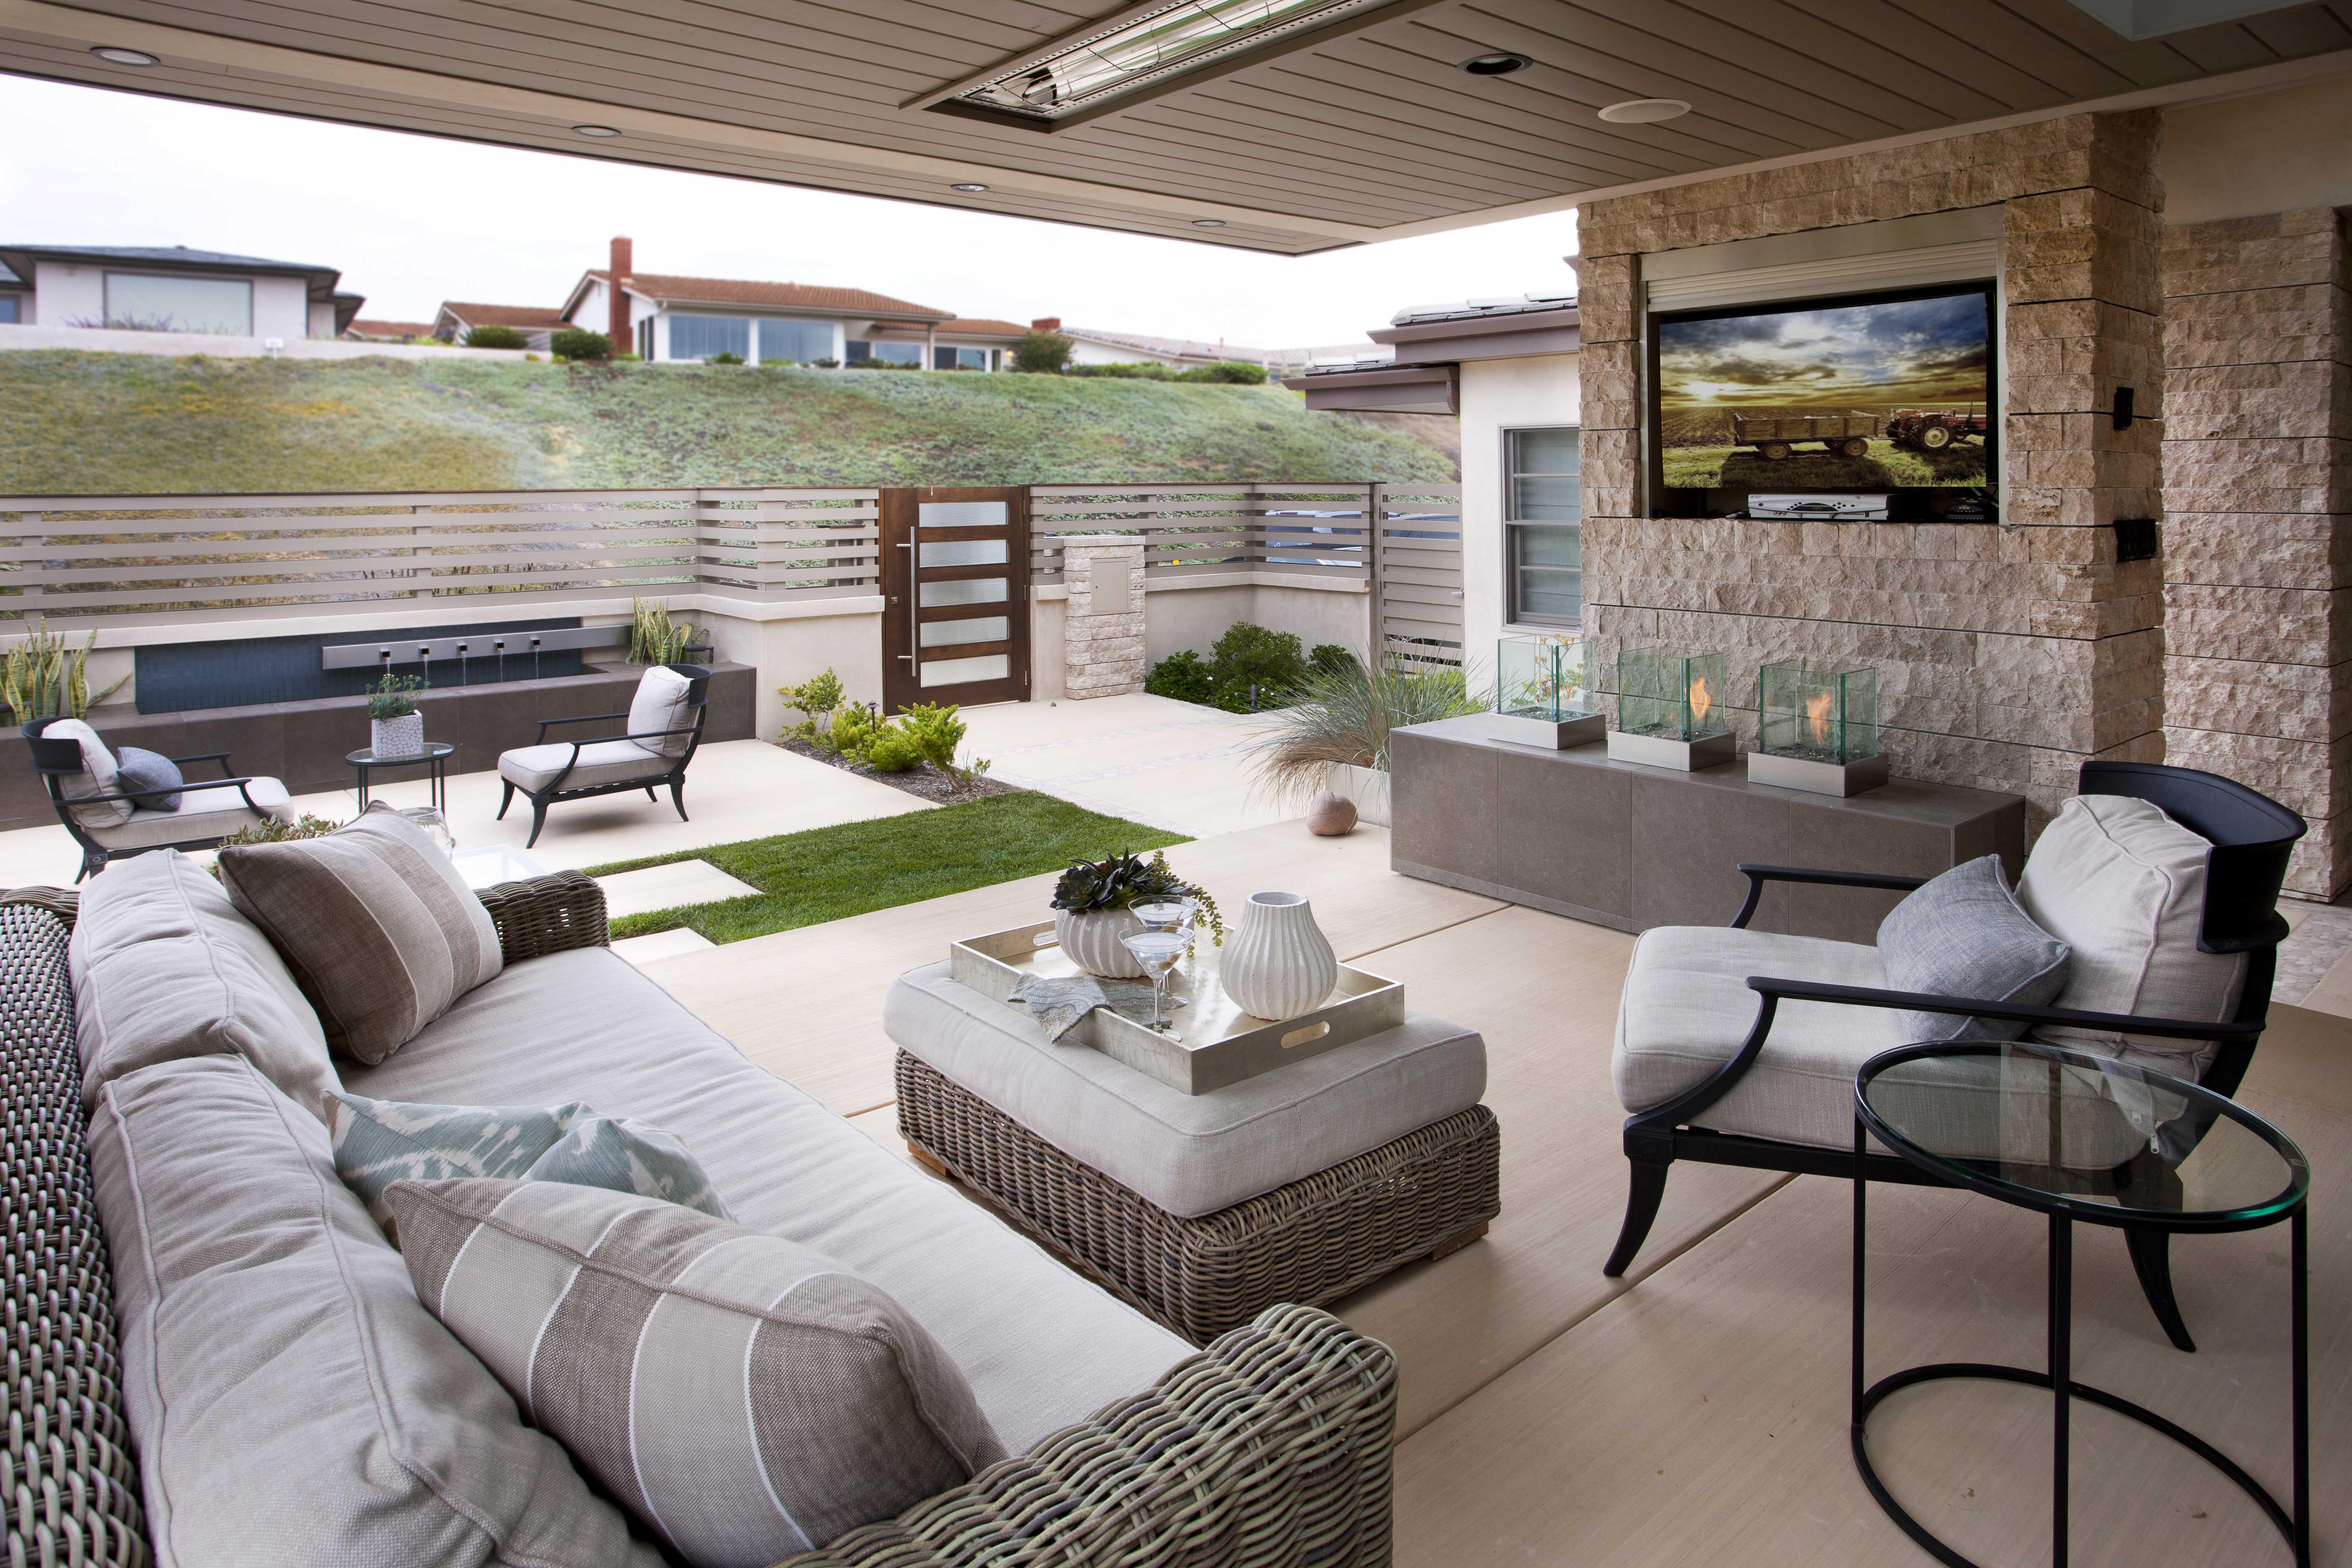 outdoor designs san diego landscape designer: landscape plans and onsite consulting SOAXAOP